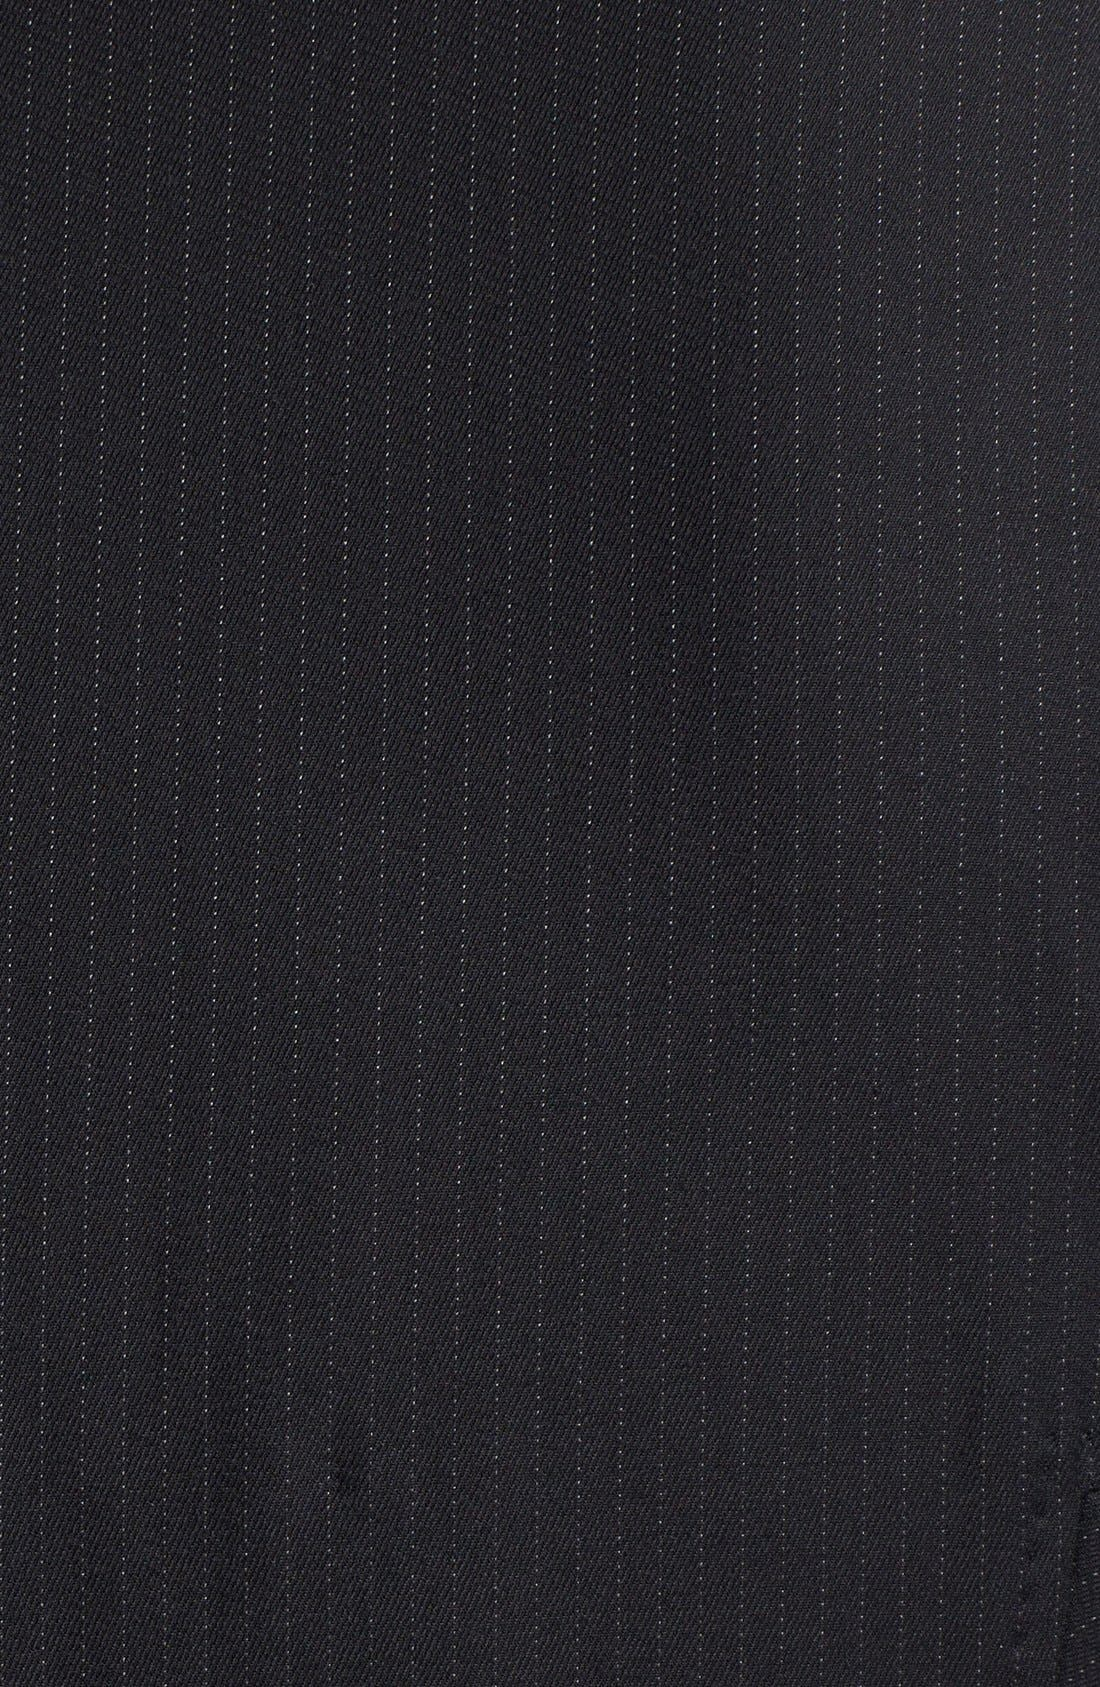 Alternate Image 3  - BOSS HUGO BOSS 'Dilluka' Pinstripe Dress